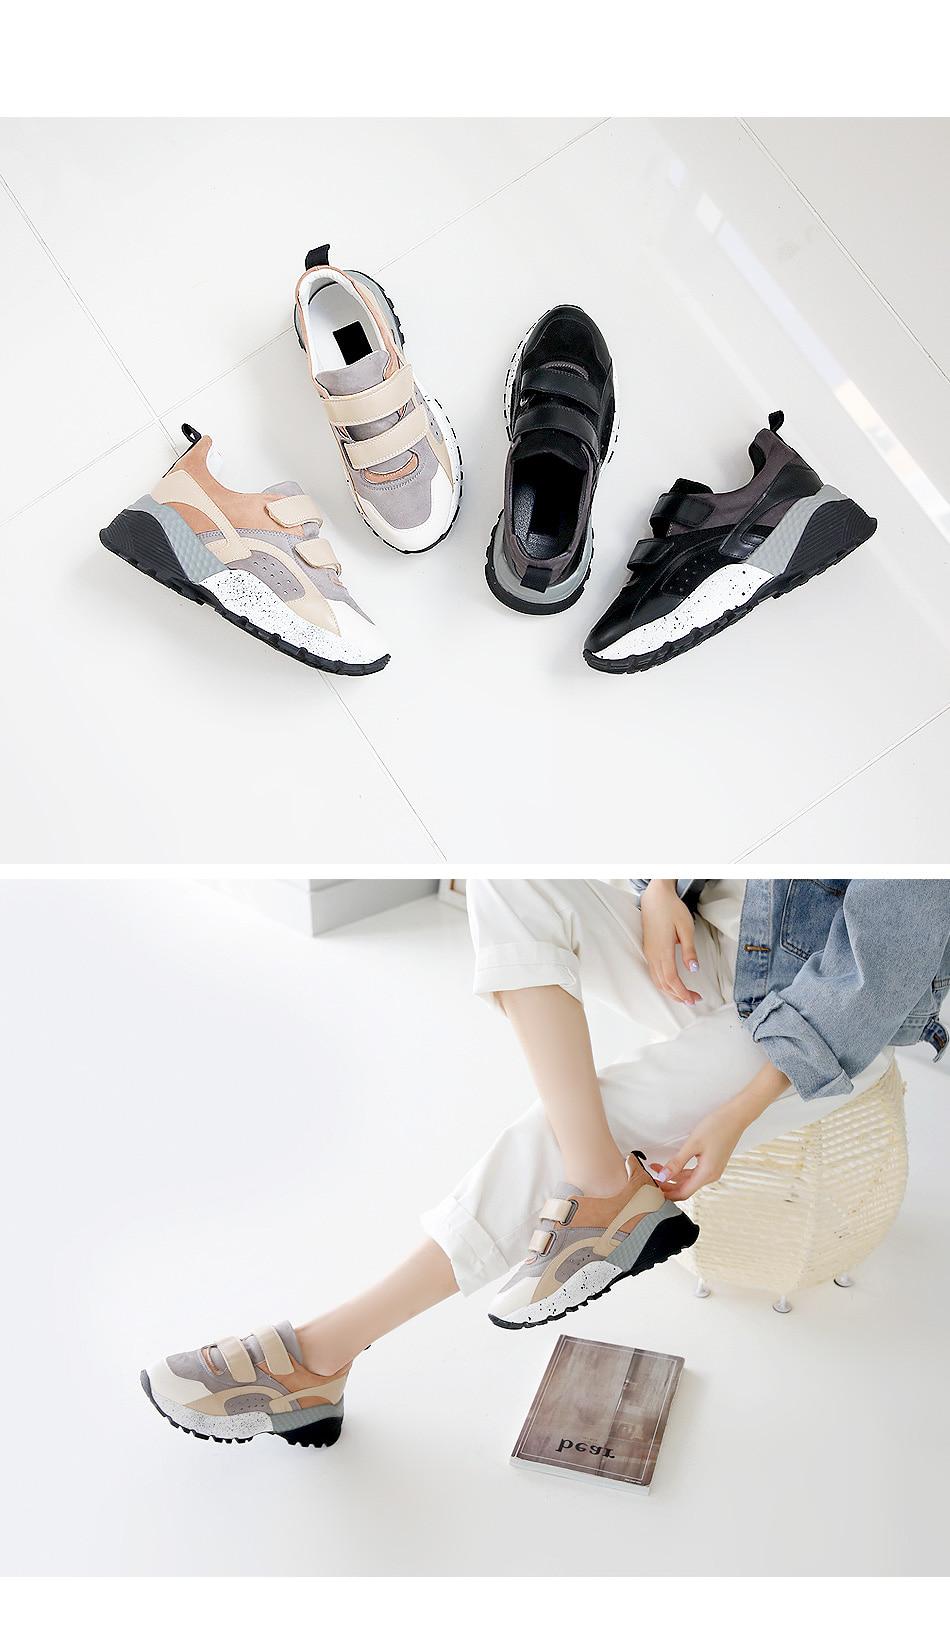 Nut Velcro Sneakers 5cm